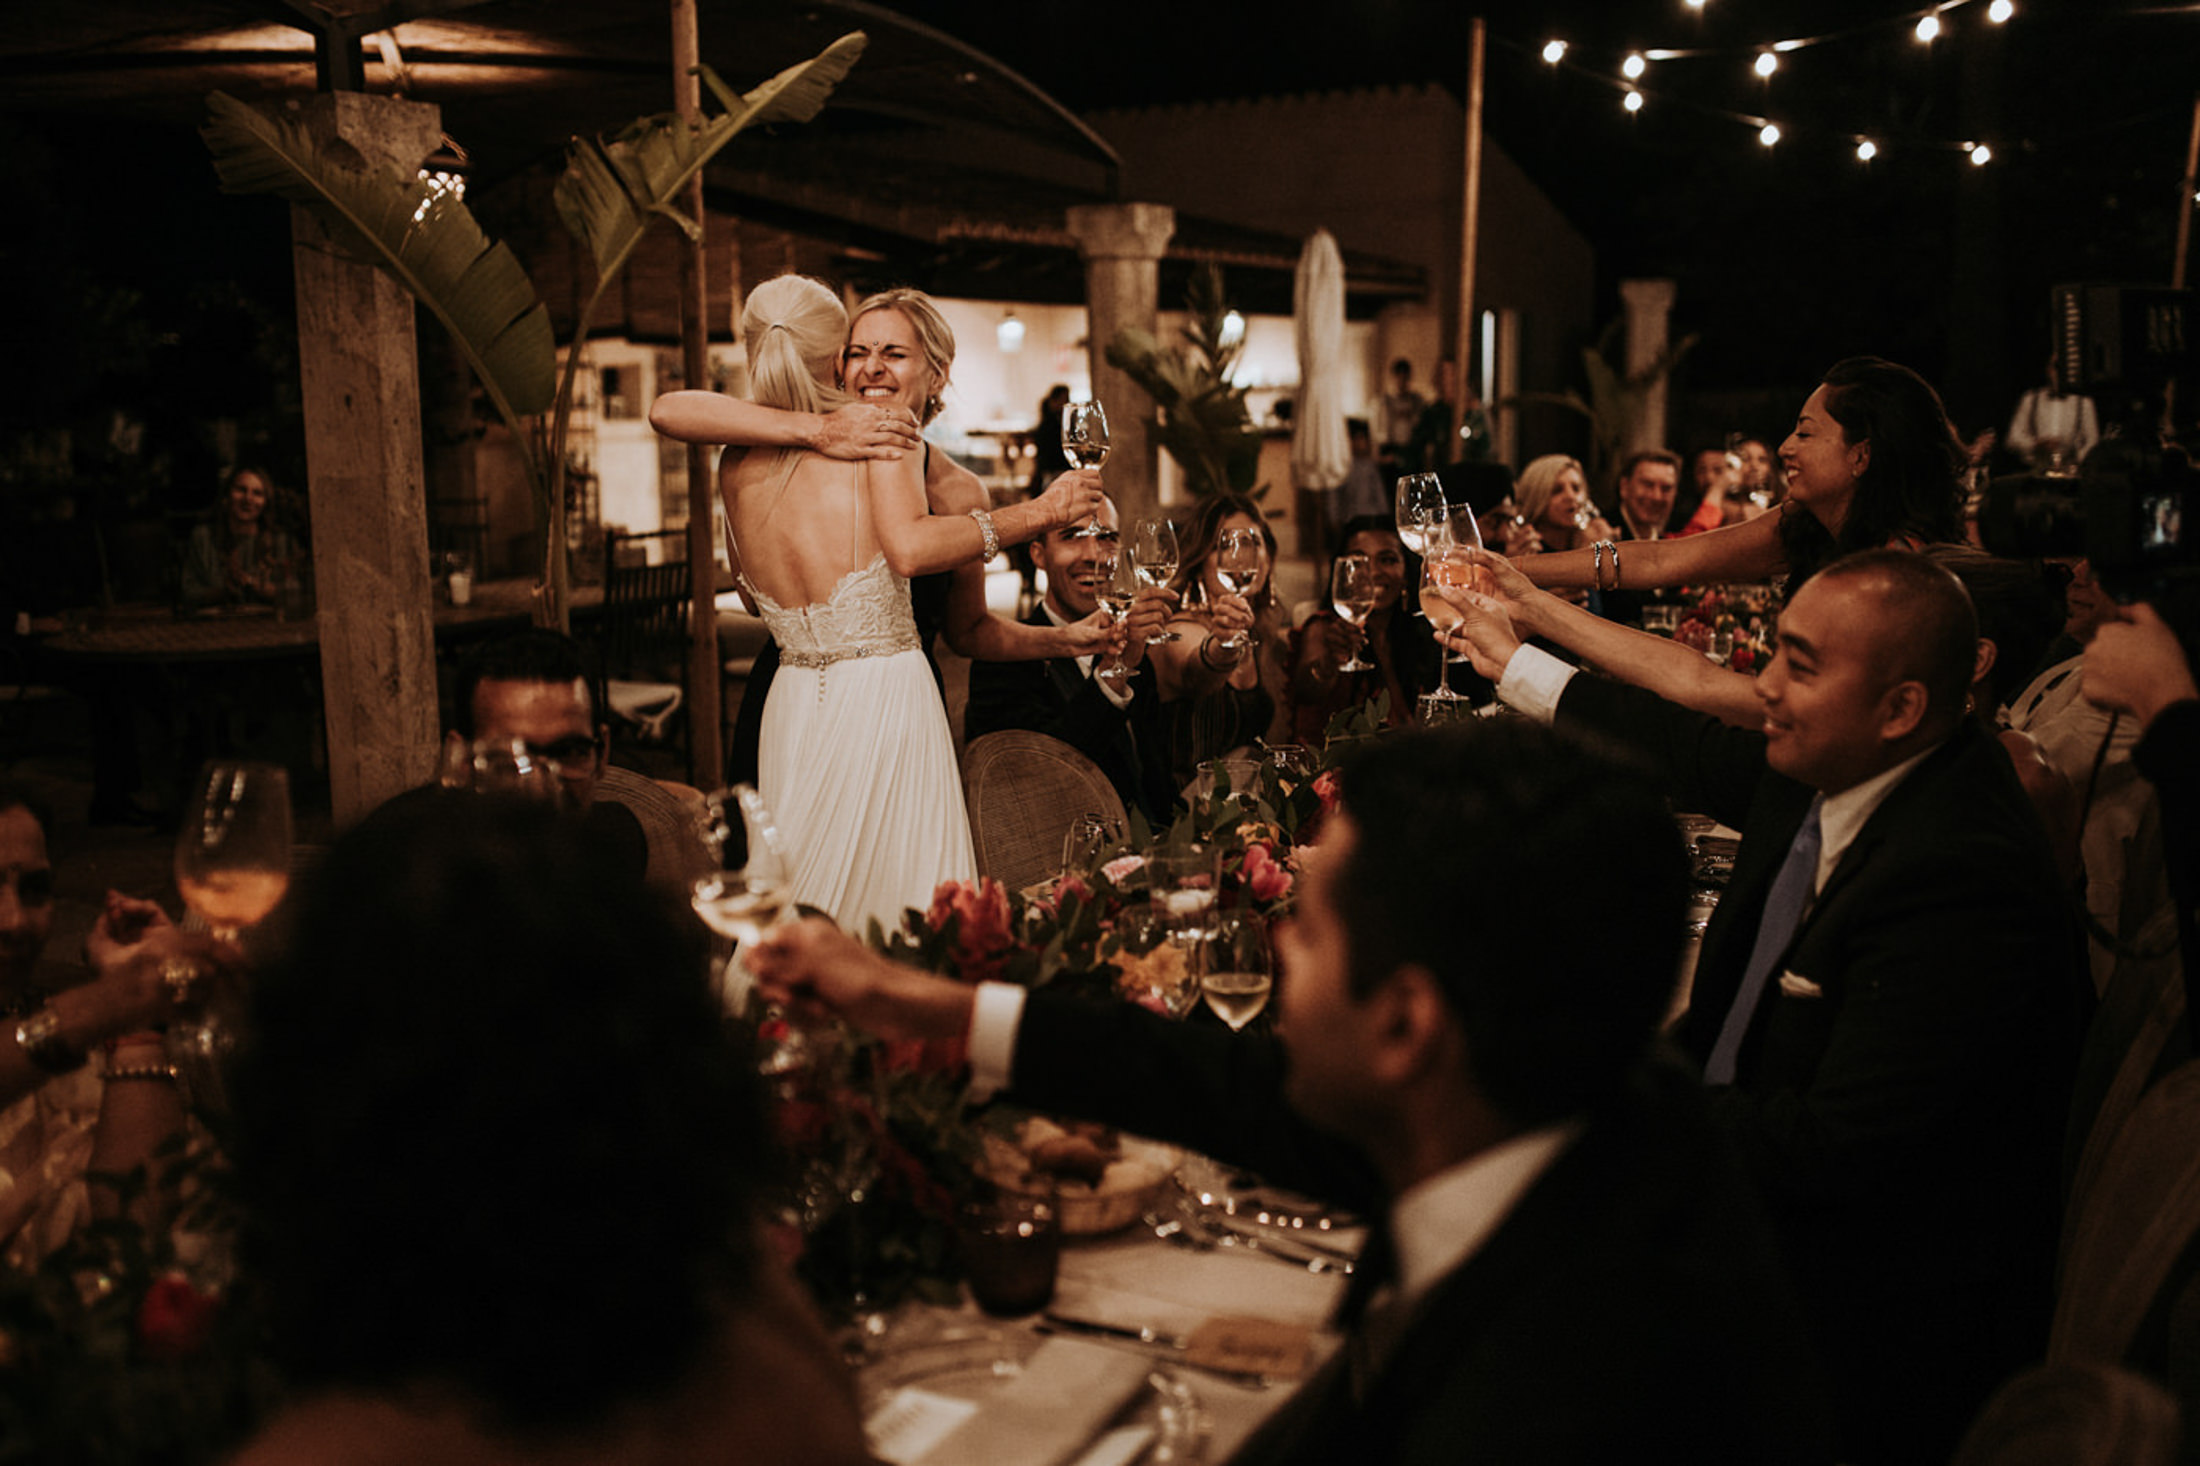 Wedding_Photographer_Mallorca_Daniela-Marquardt_Photography_New_York_Iceland_Tuscany_Santorini_Portugal_Austria_Bavaria_Elopement_Hochzeitsfotograf_AntjeRajat2_113